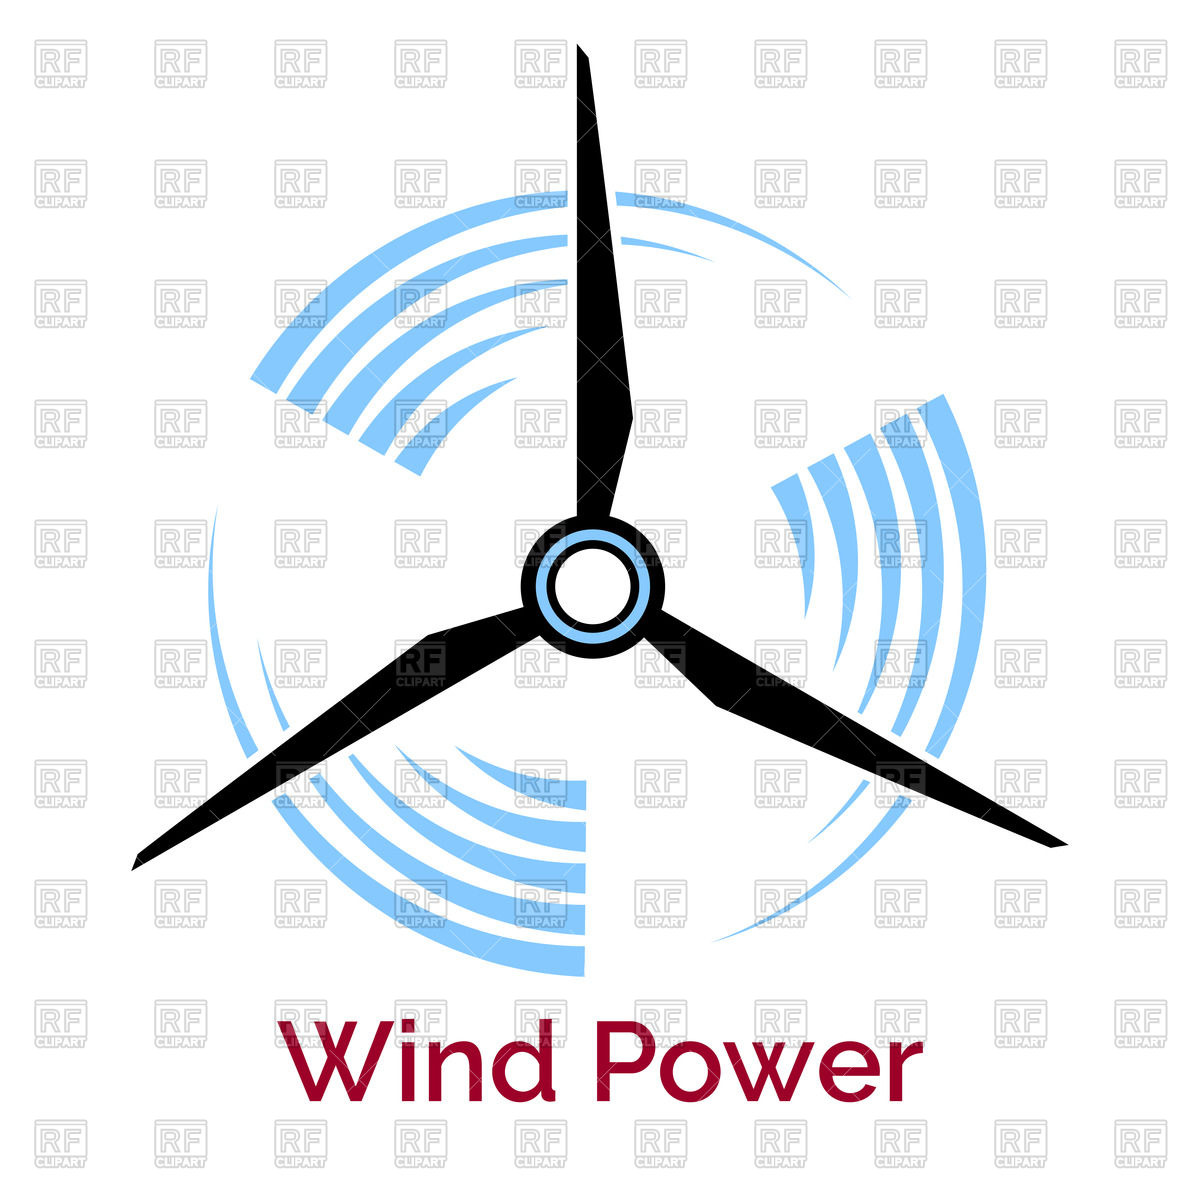 1200x1200 Company Logo With Wind Turbine And Slogan Wind Power Royalty